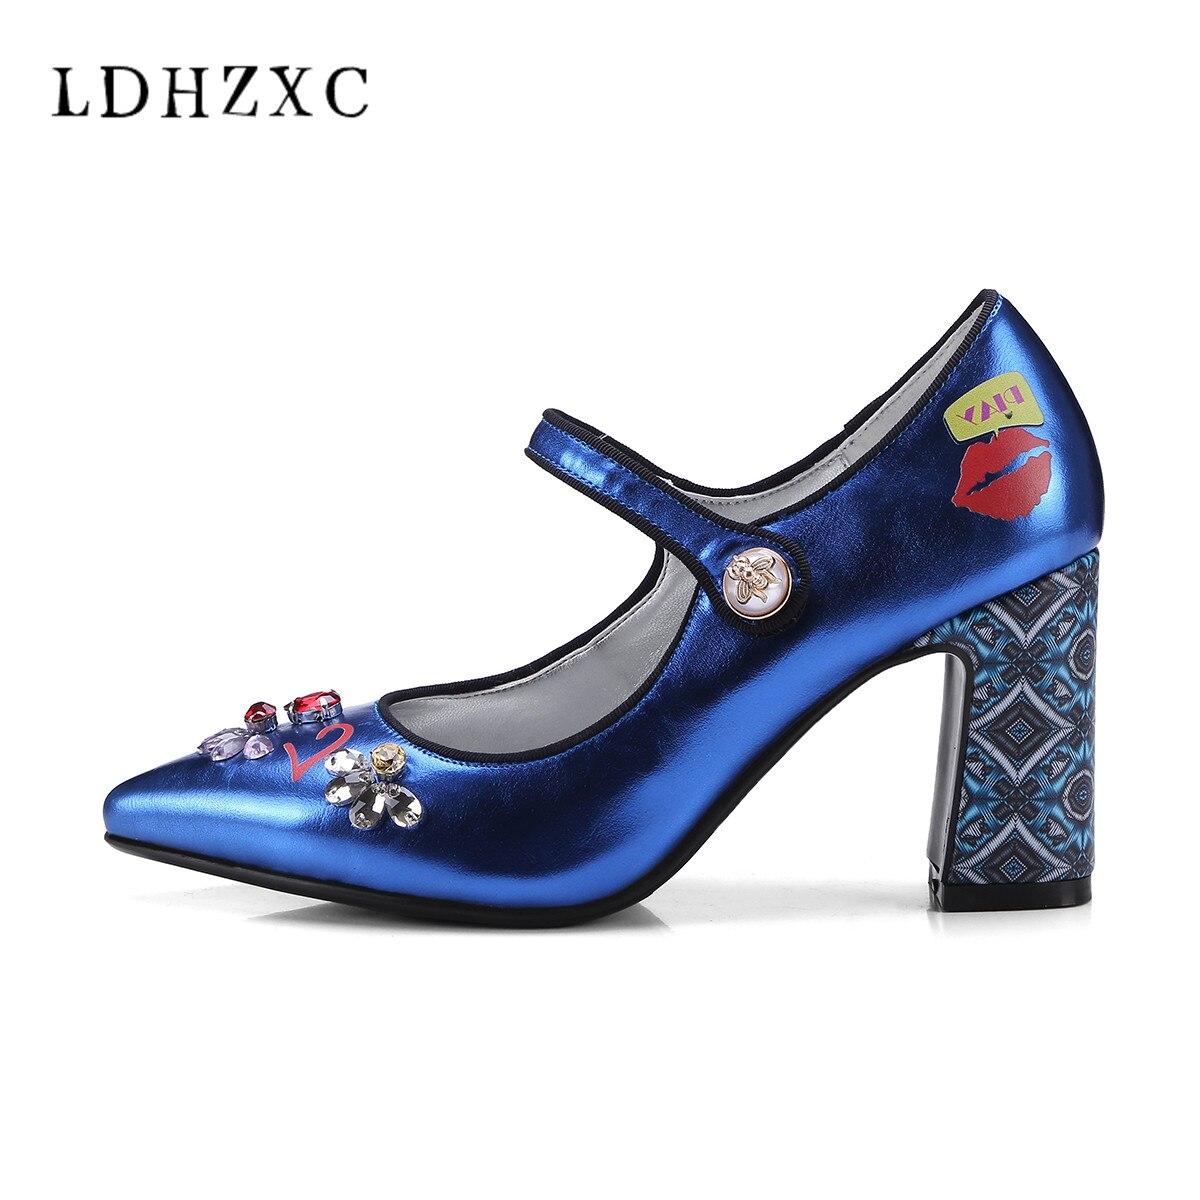 Azul Tacones Del Altos Mujer Dedo Sexy Mary plata Stilettos Pie Gladiator Punta Bombas Janes Azul Genuino Zapatos Ldhzxc Cuero ATWv1Rq1